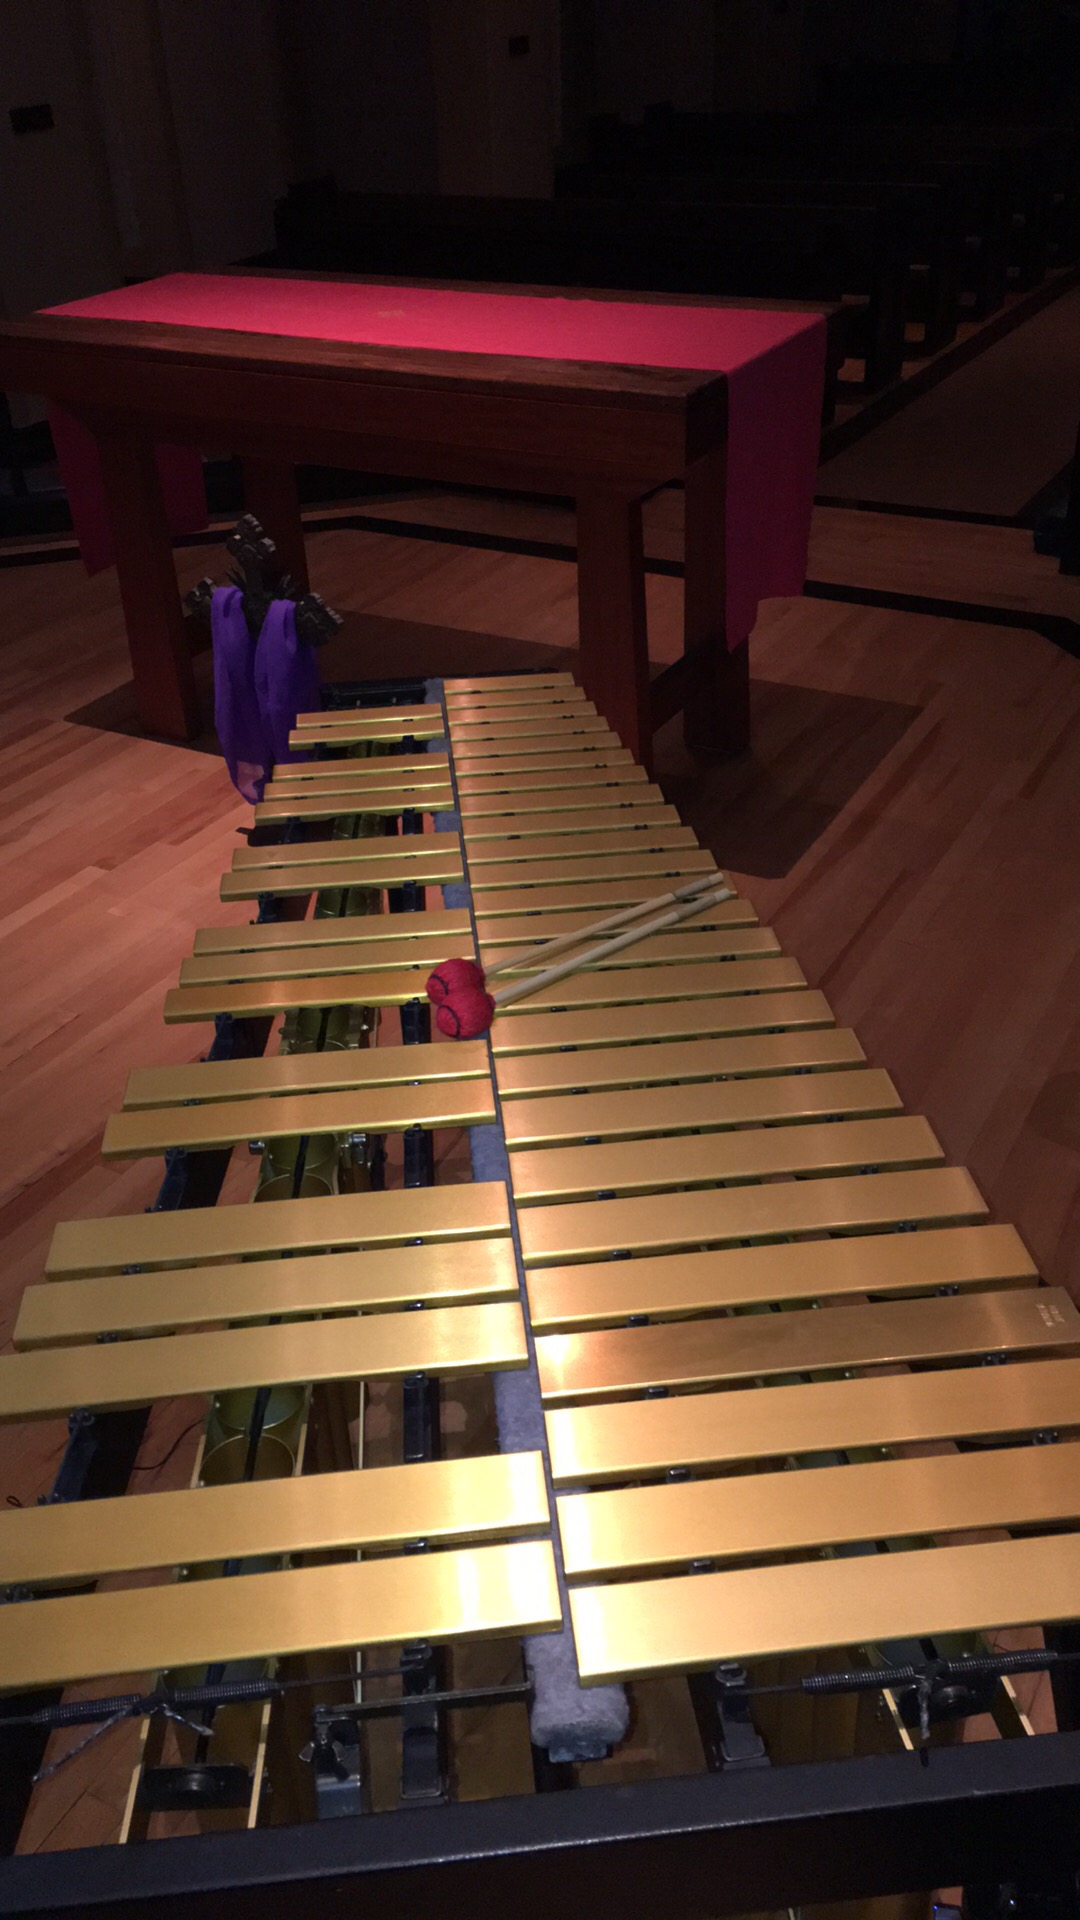 Experiencing  God through music